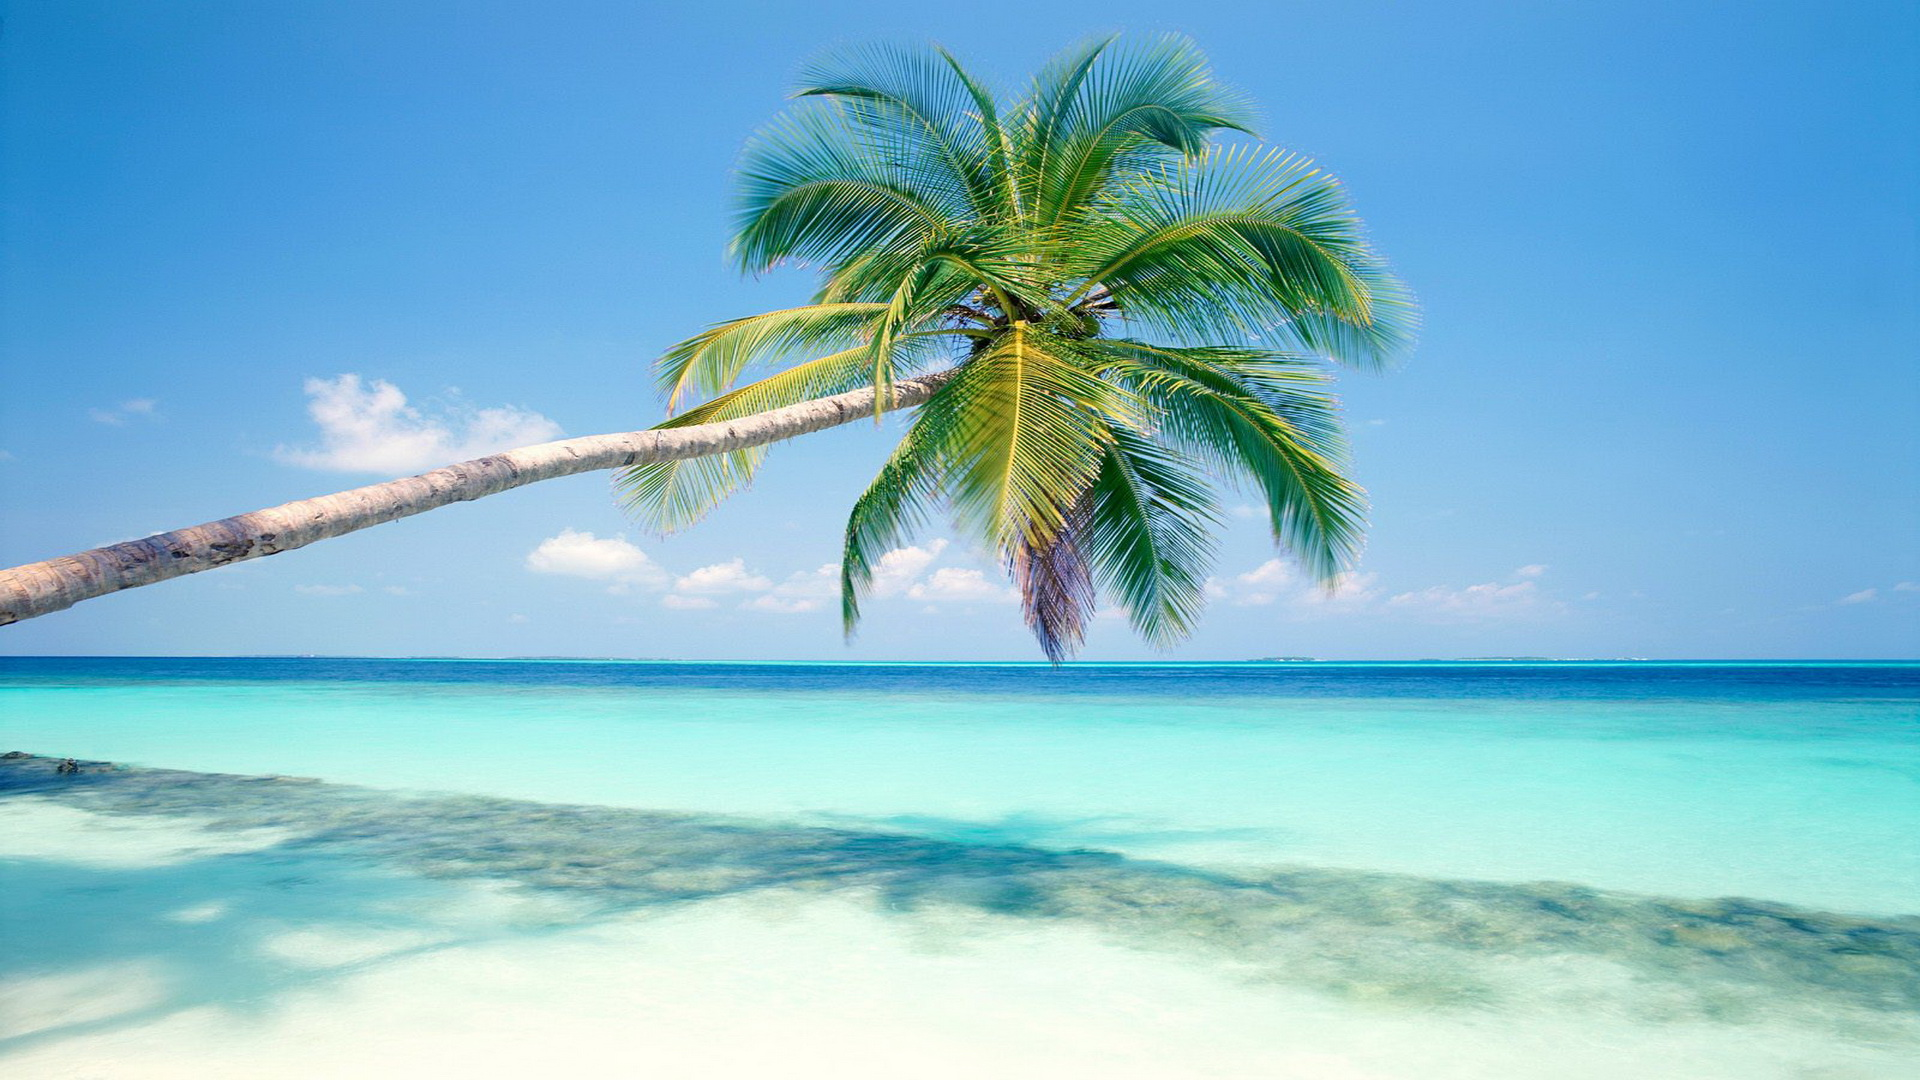 Pin Tropical Island Landscape 1920x1080 on Pinterest